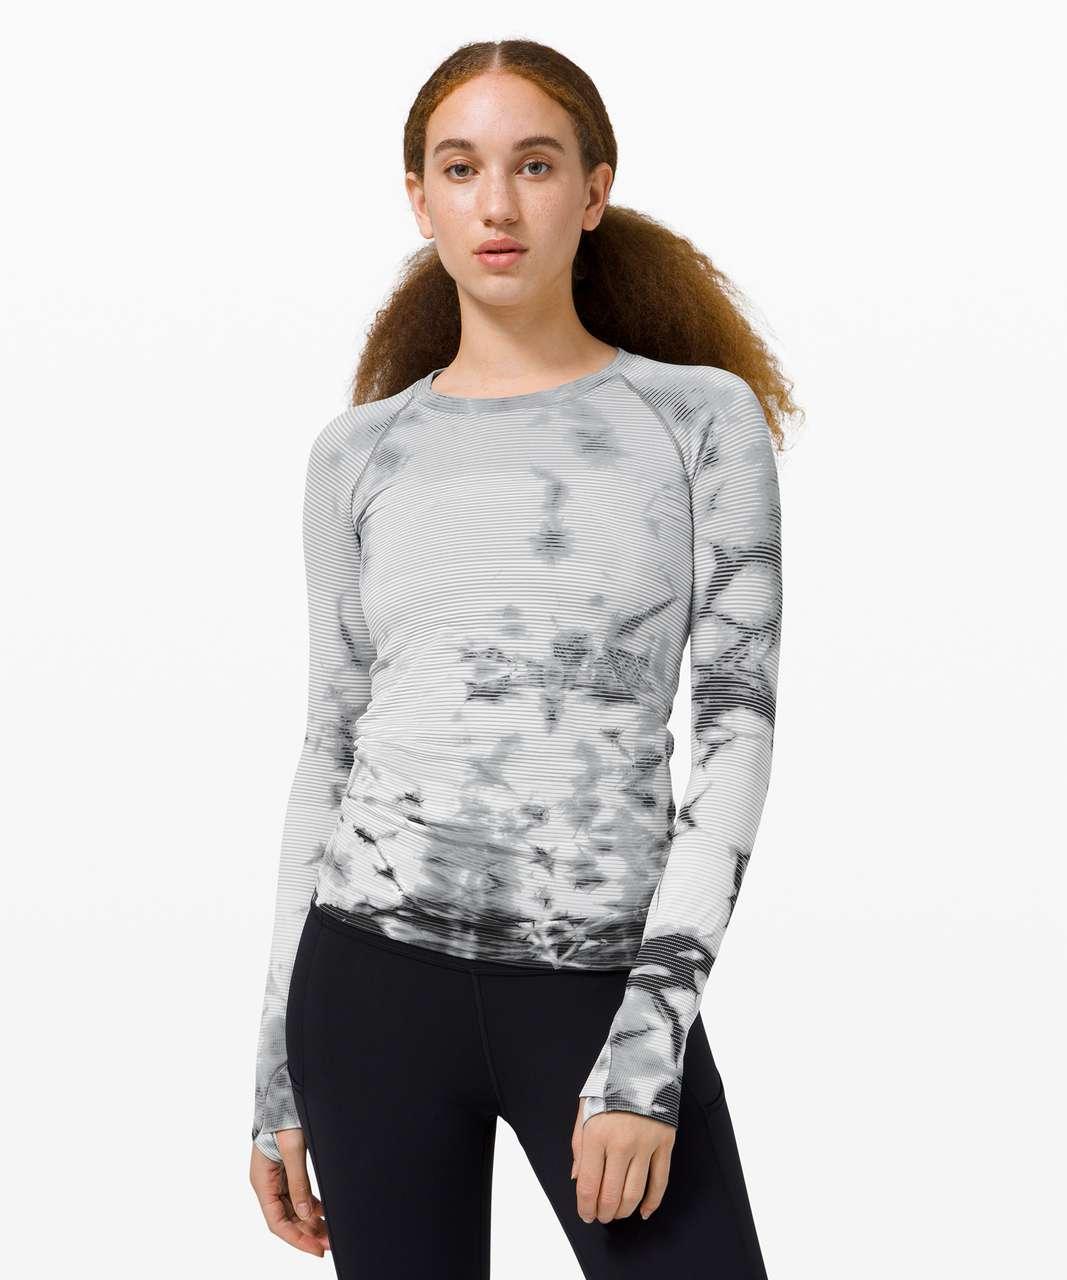 Lululemon Swiftly Tech Long Sleeve 2.0 *MultiDye - Shibori Stripe Graphite Grey